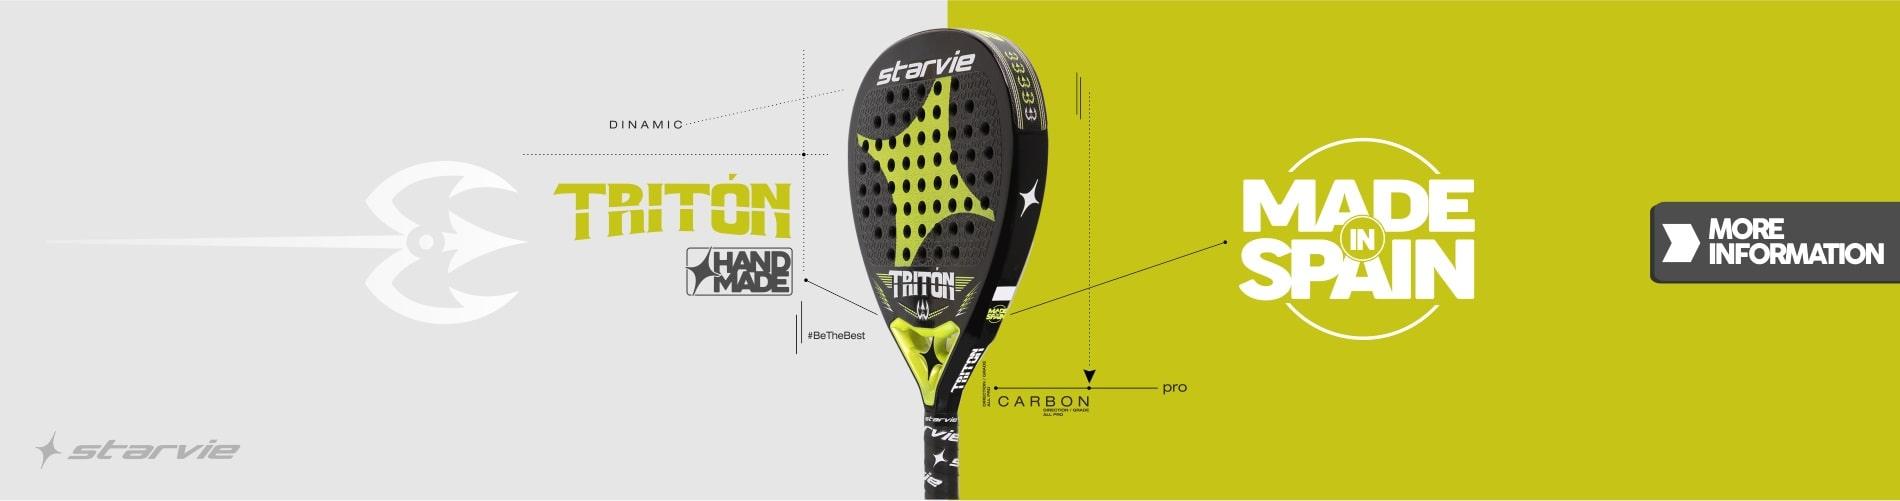 Triton StarVie padel racket